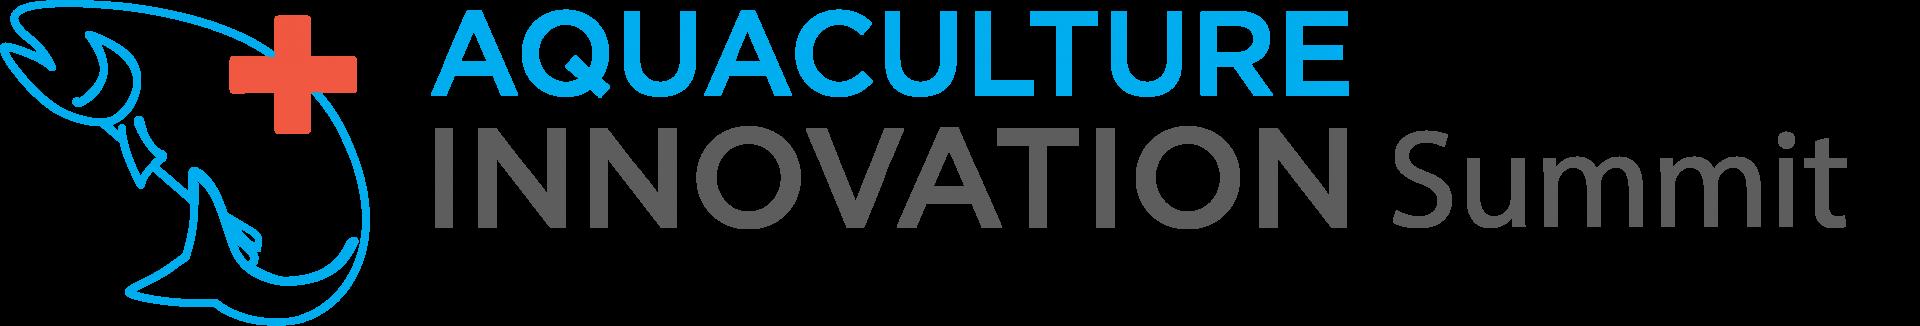 Aquaculture Innovation Summit 2021